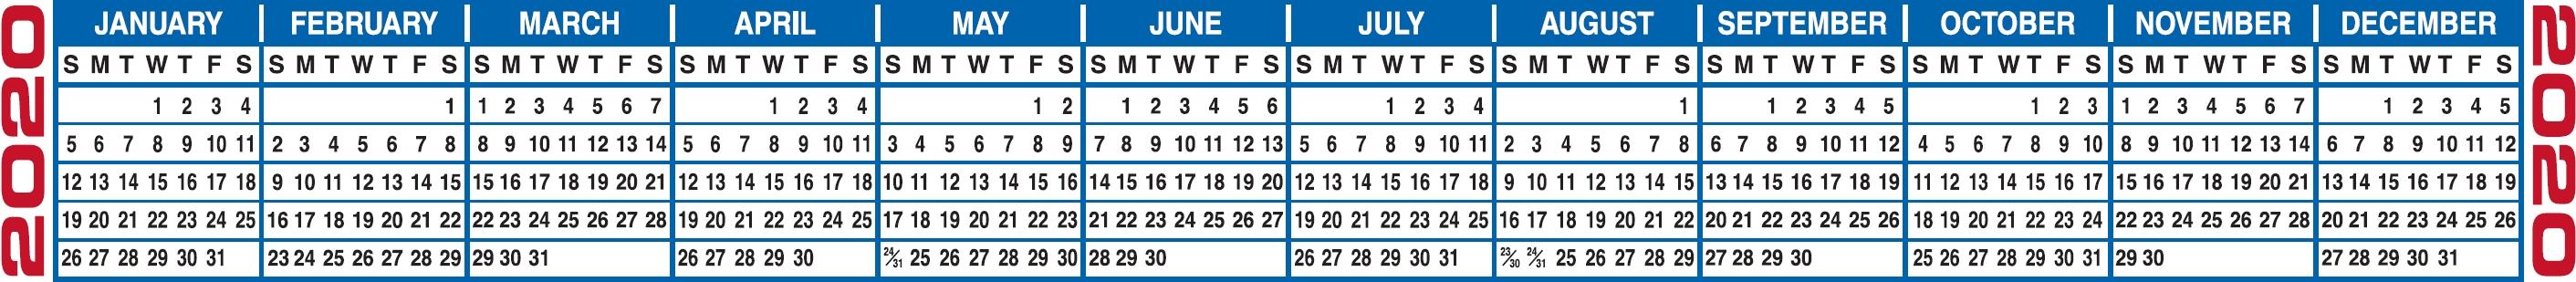 Free Printable 2021 Calendars & 2021 Calendar Strips Print 2021 Broadcast Calendar